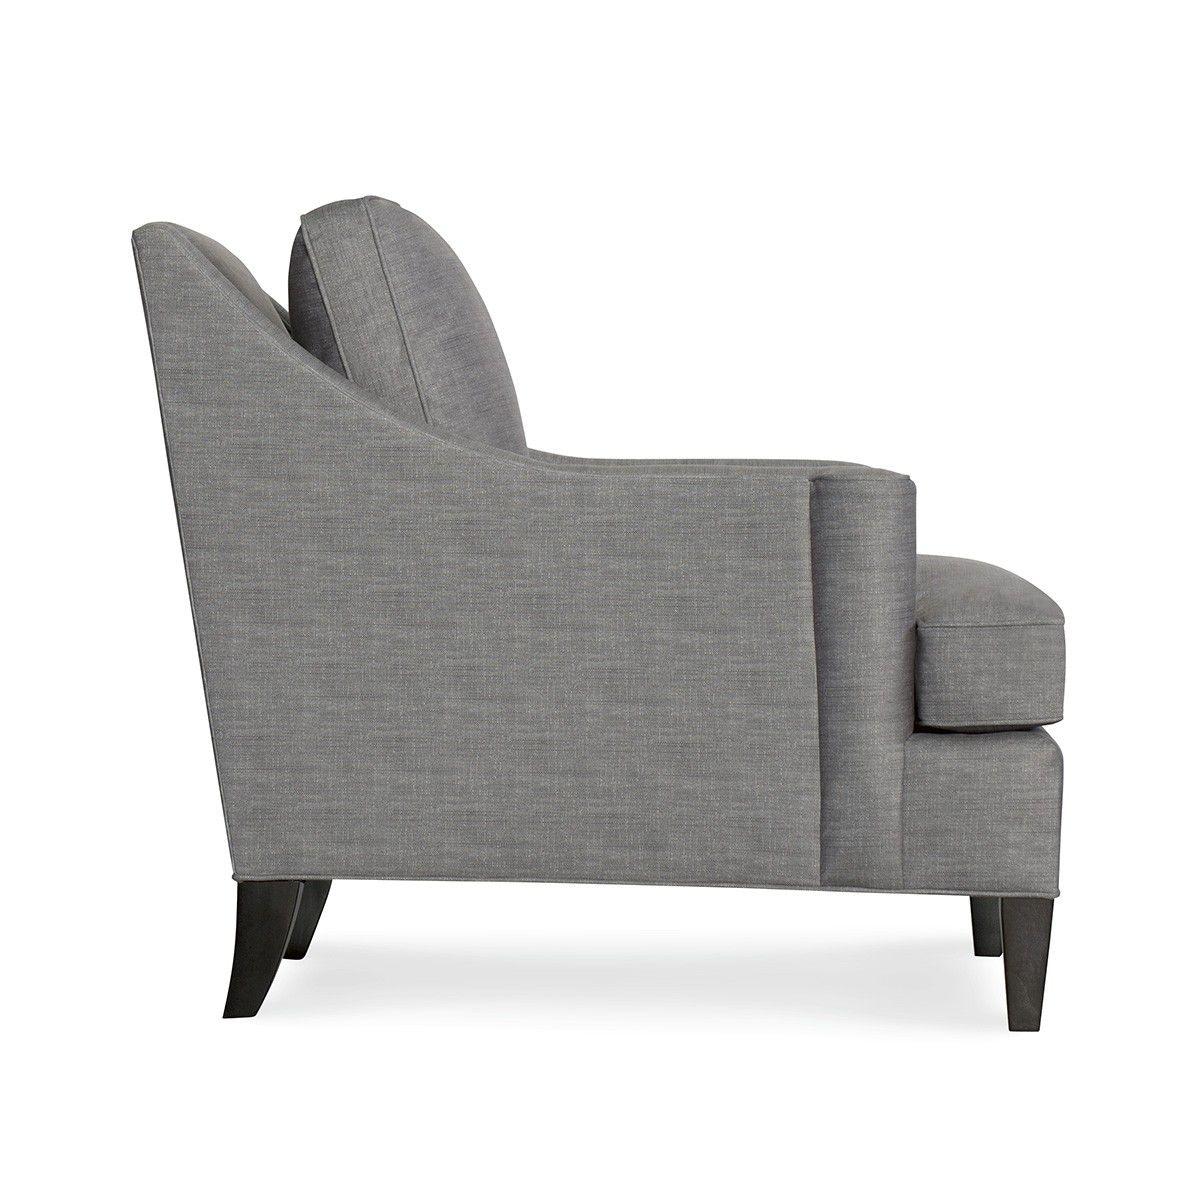 Beau CR Laine Harlow Chair 1150 05